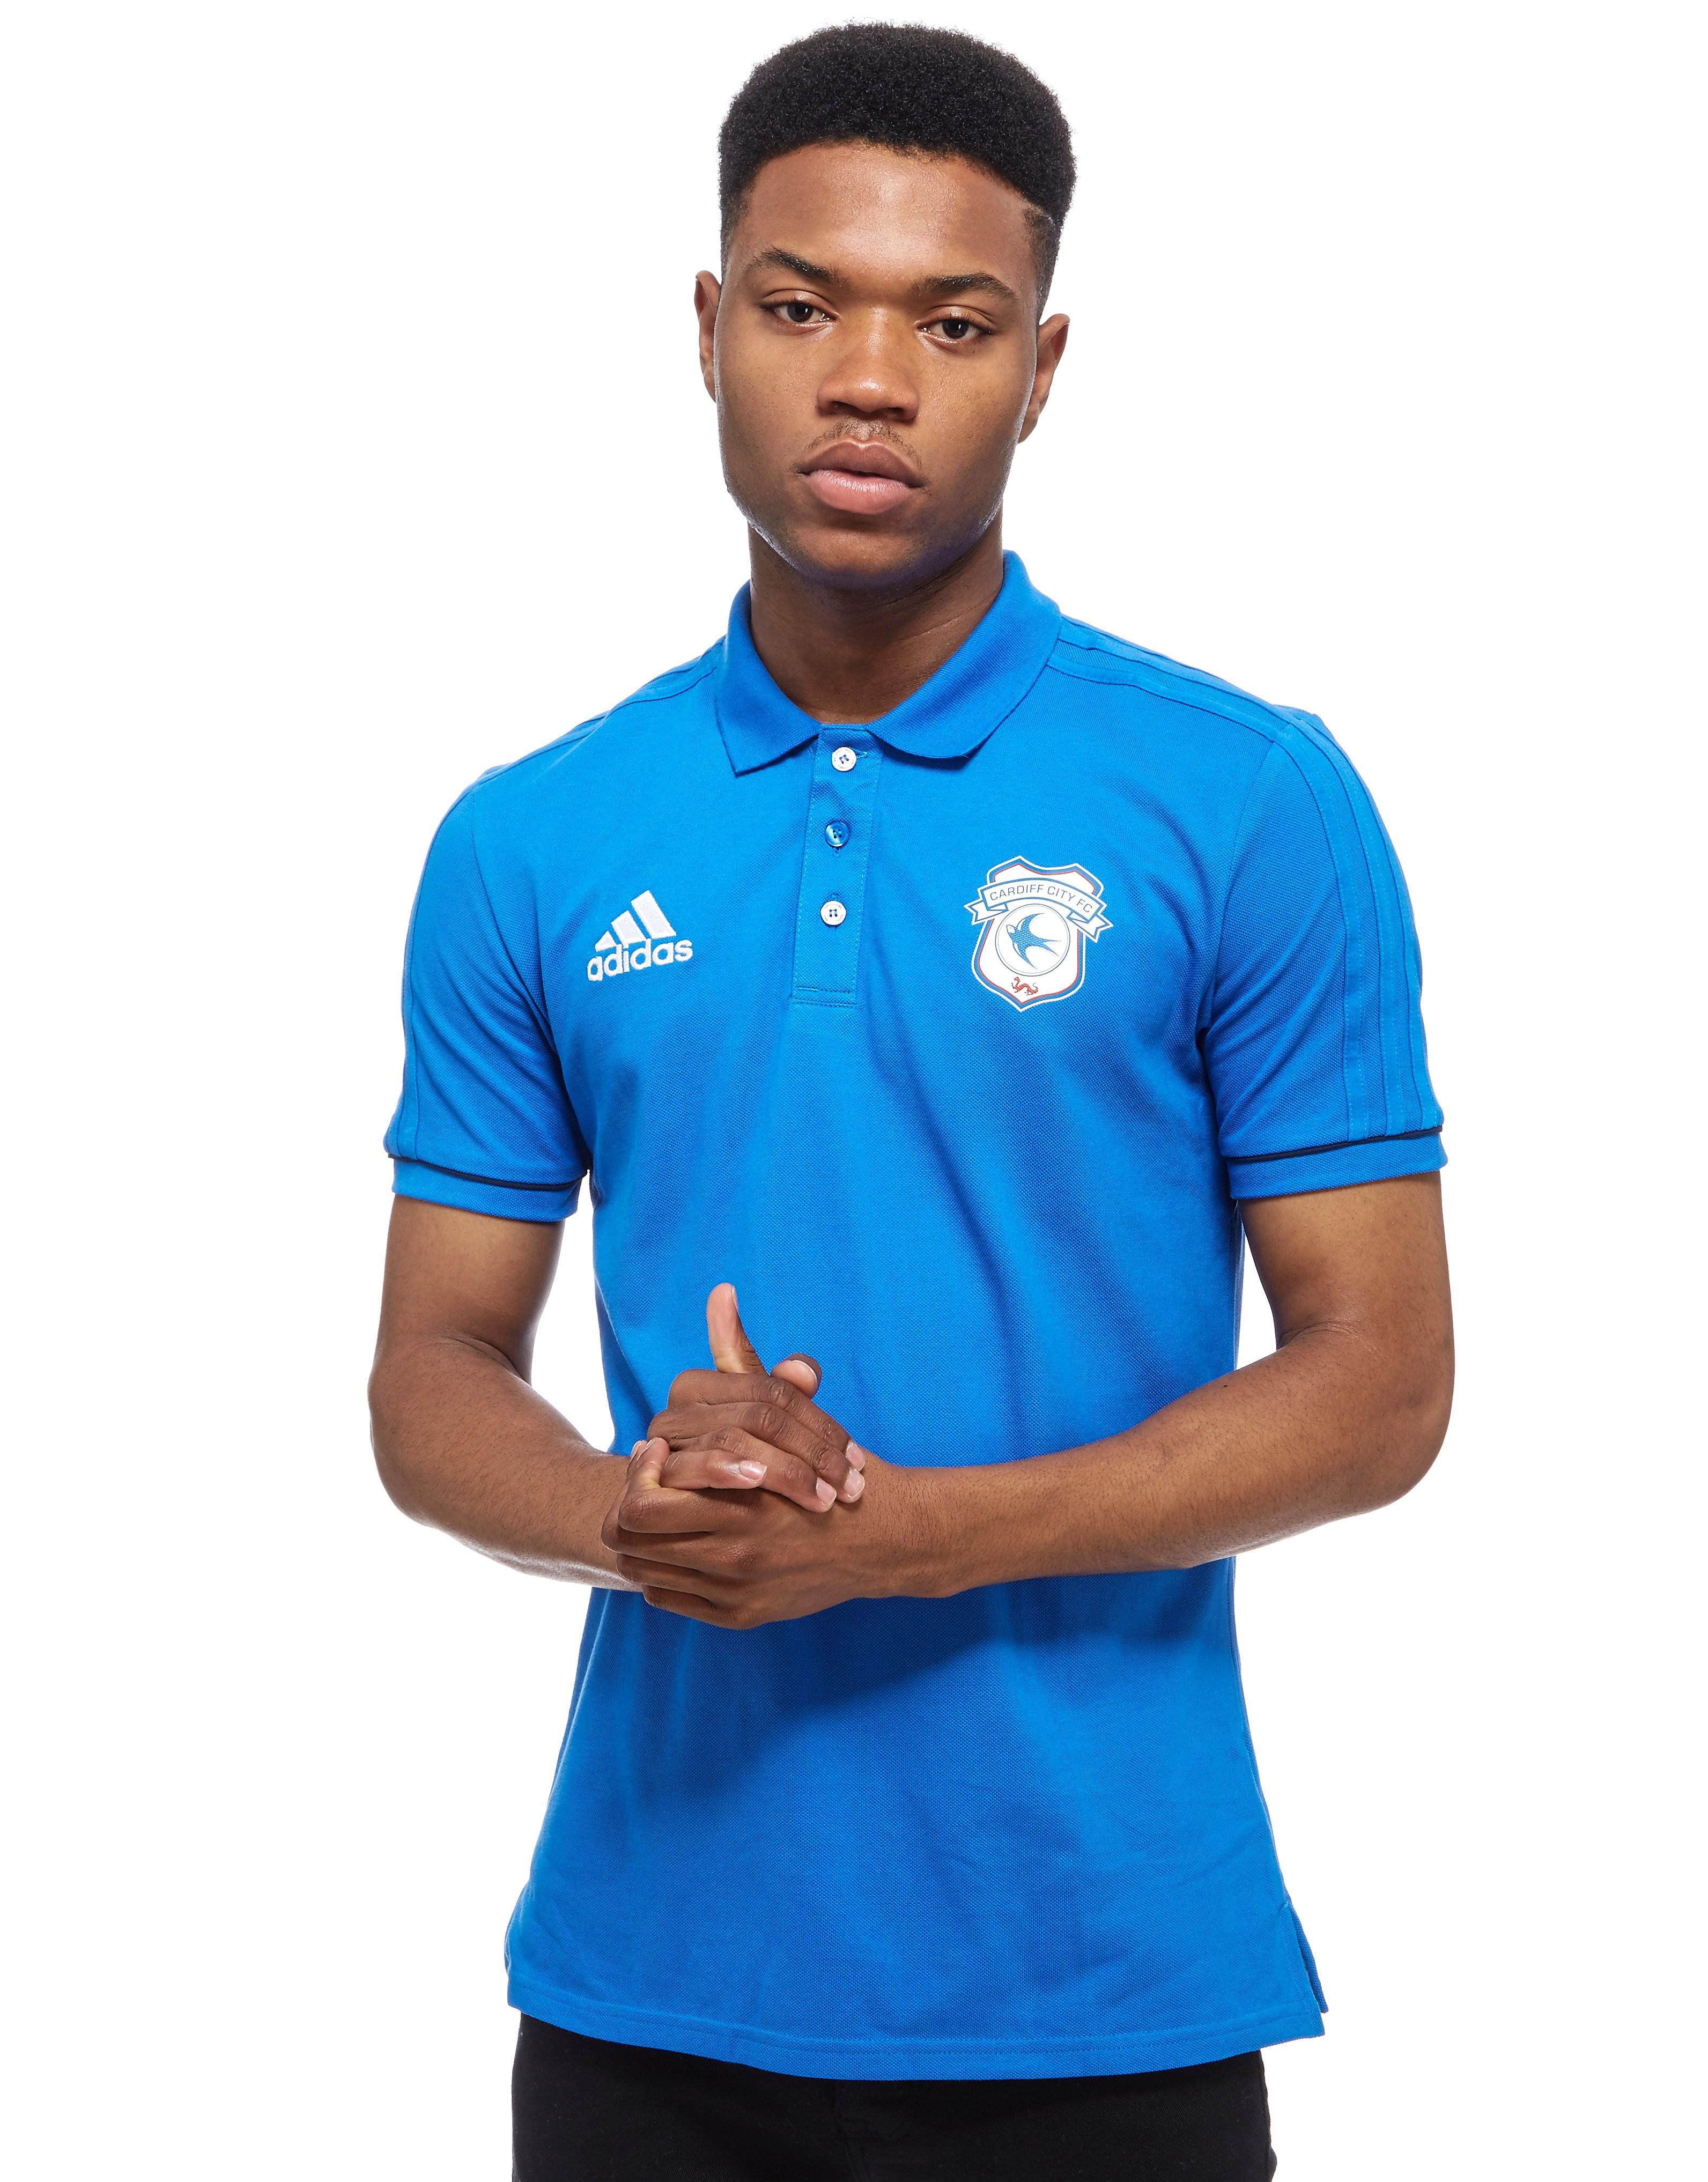 adidas Cardiff City Polo Shirt